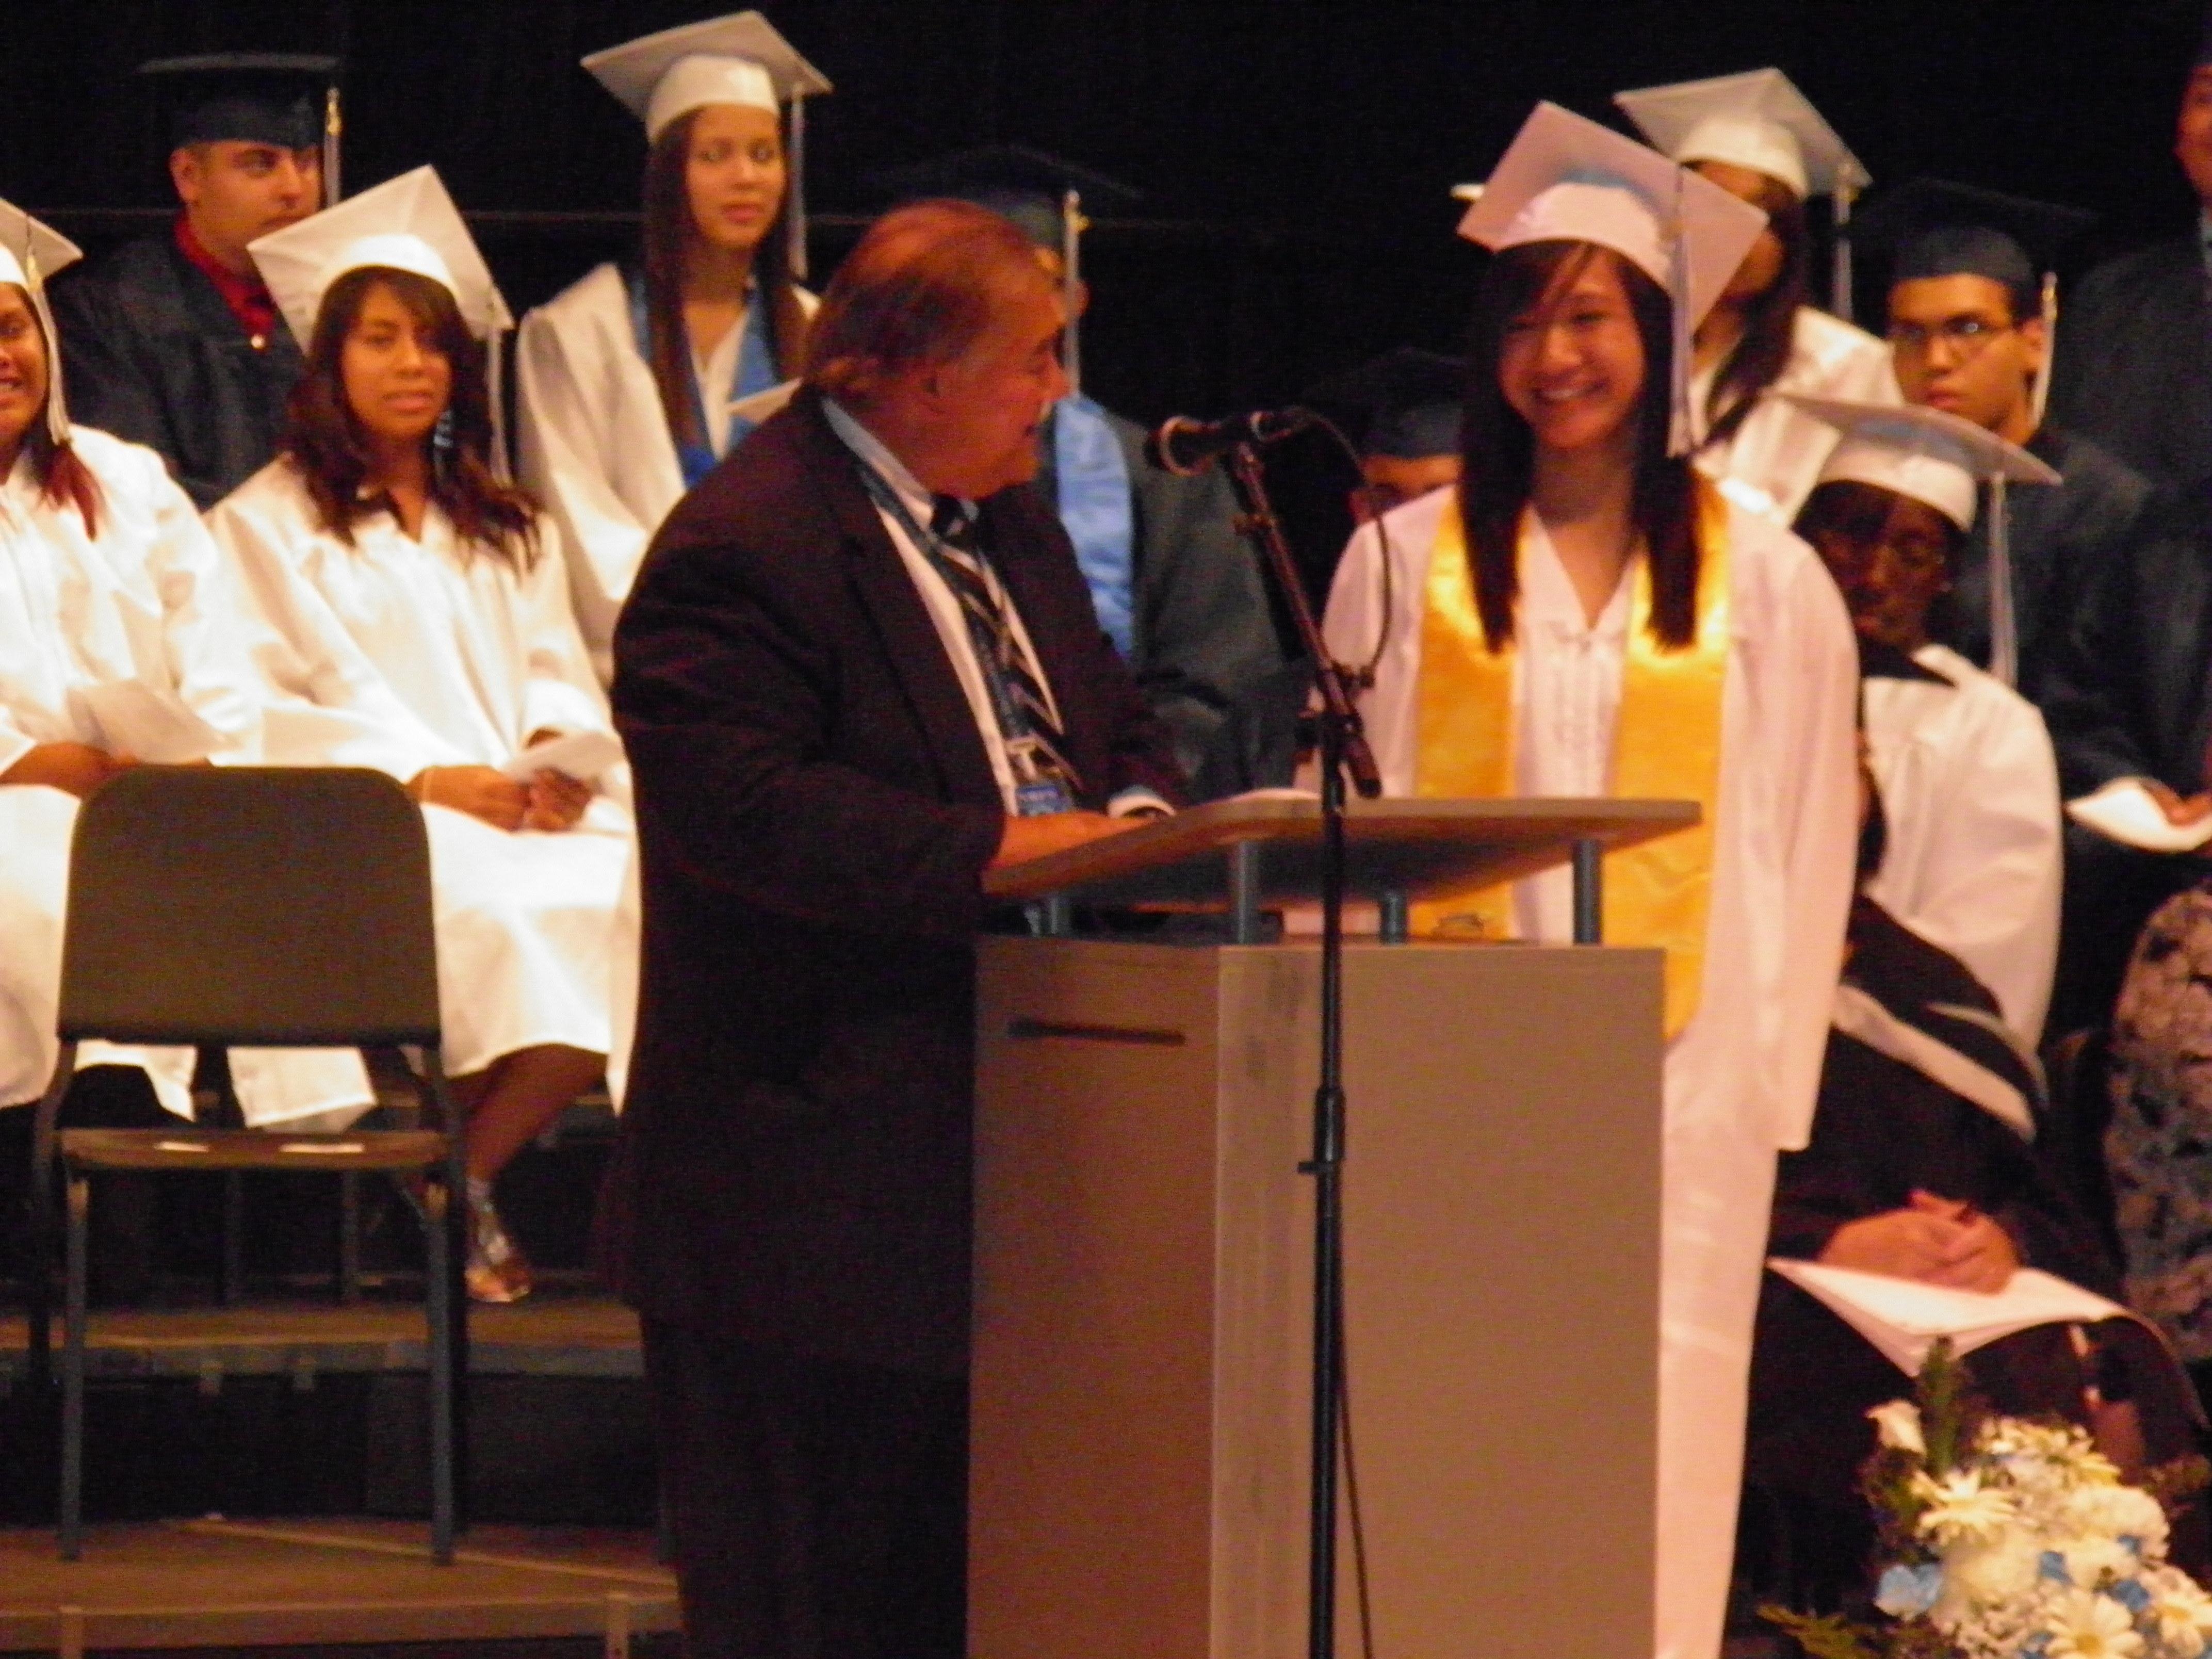 city high schools confer diplomas to 240 graduates new brunswick new brunswick health sciences technology high school salutotarian yesenia hernandez